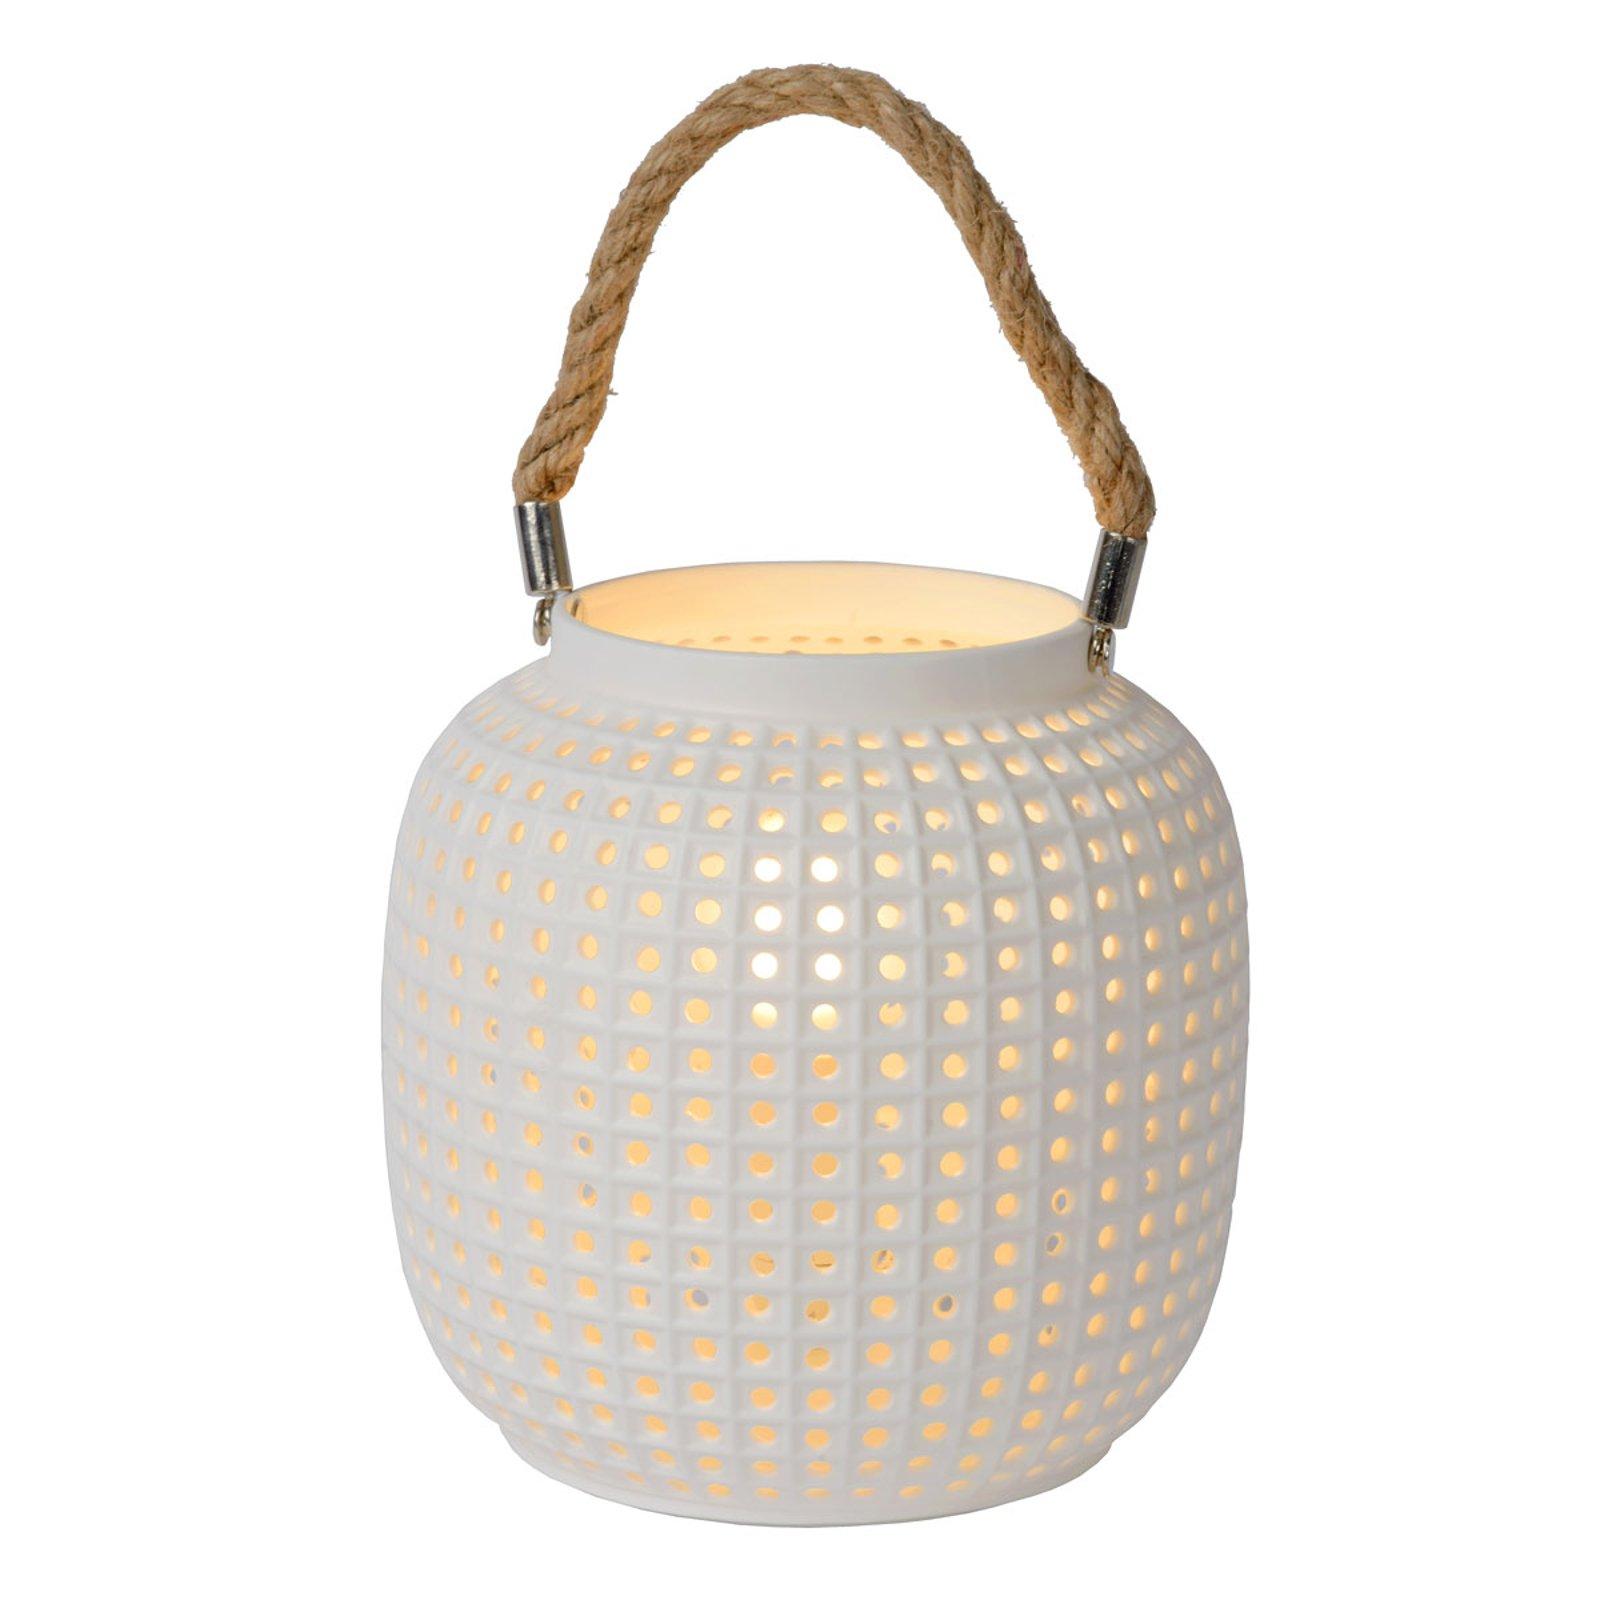 Safiya bordlampe av porselen, hvit